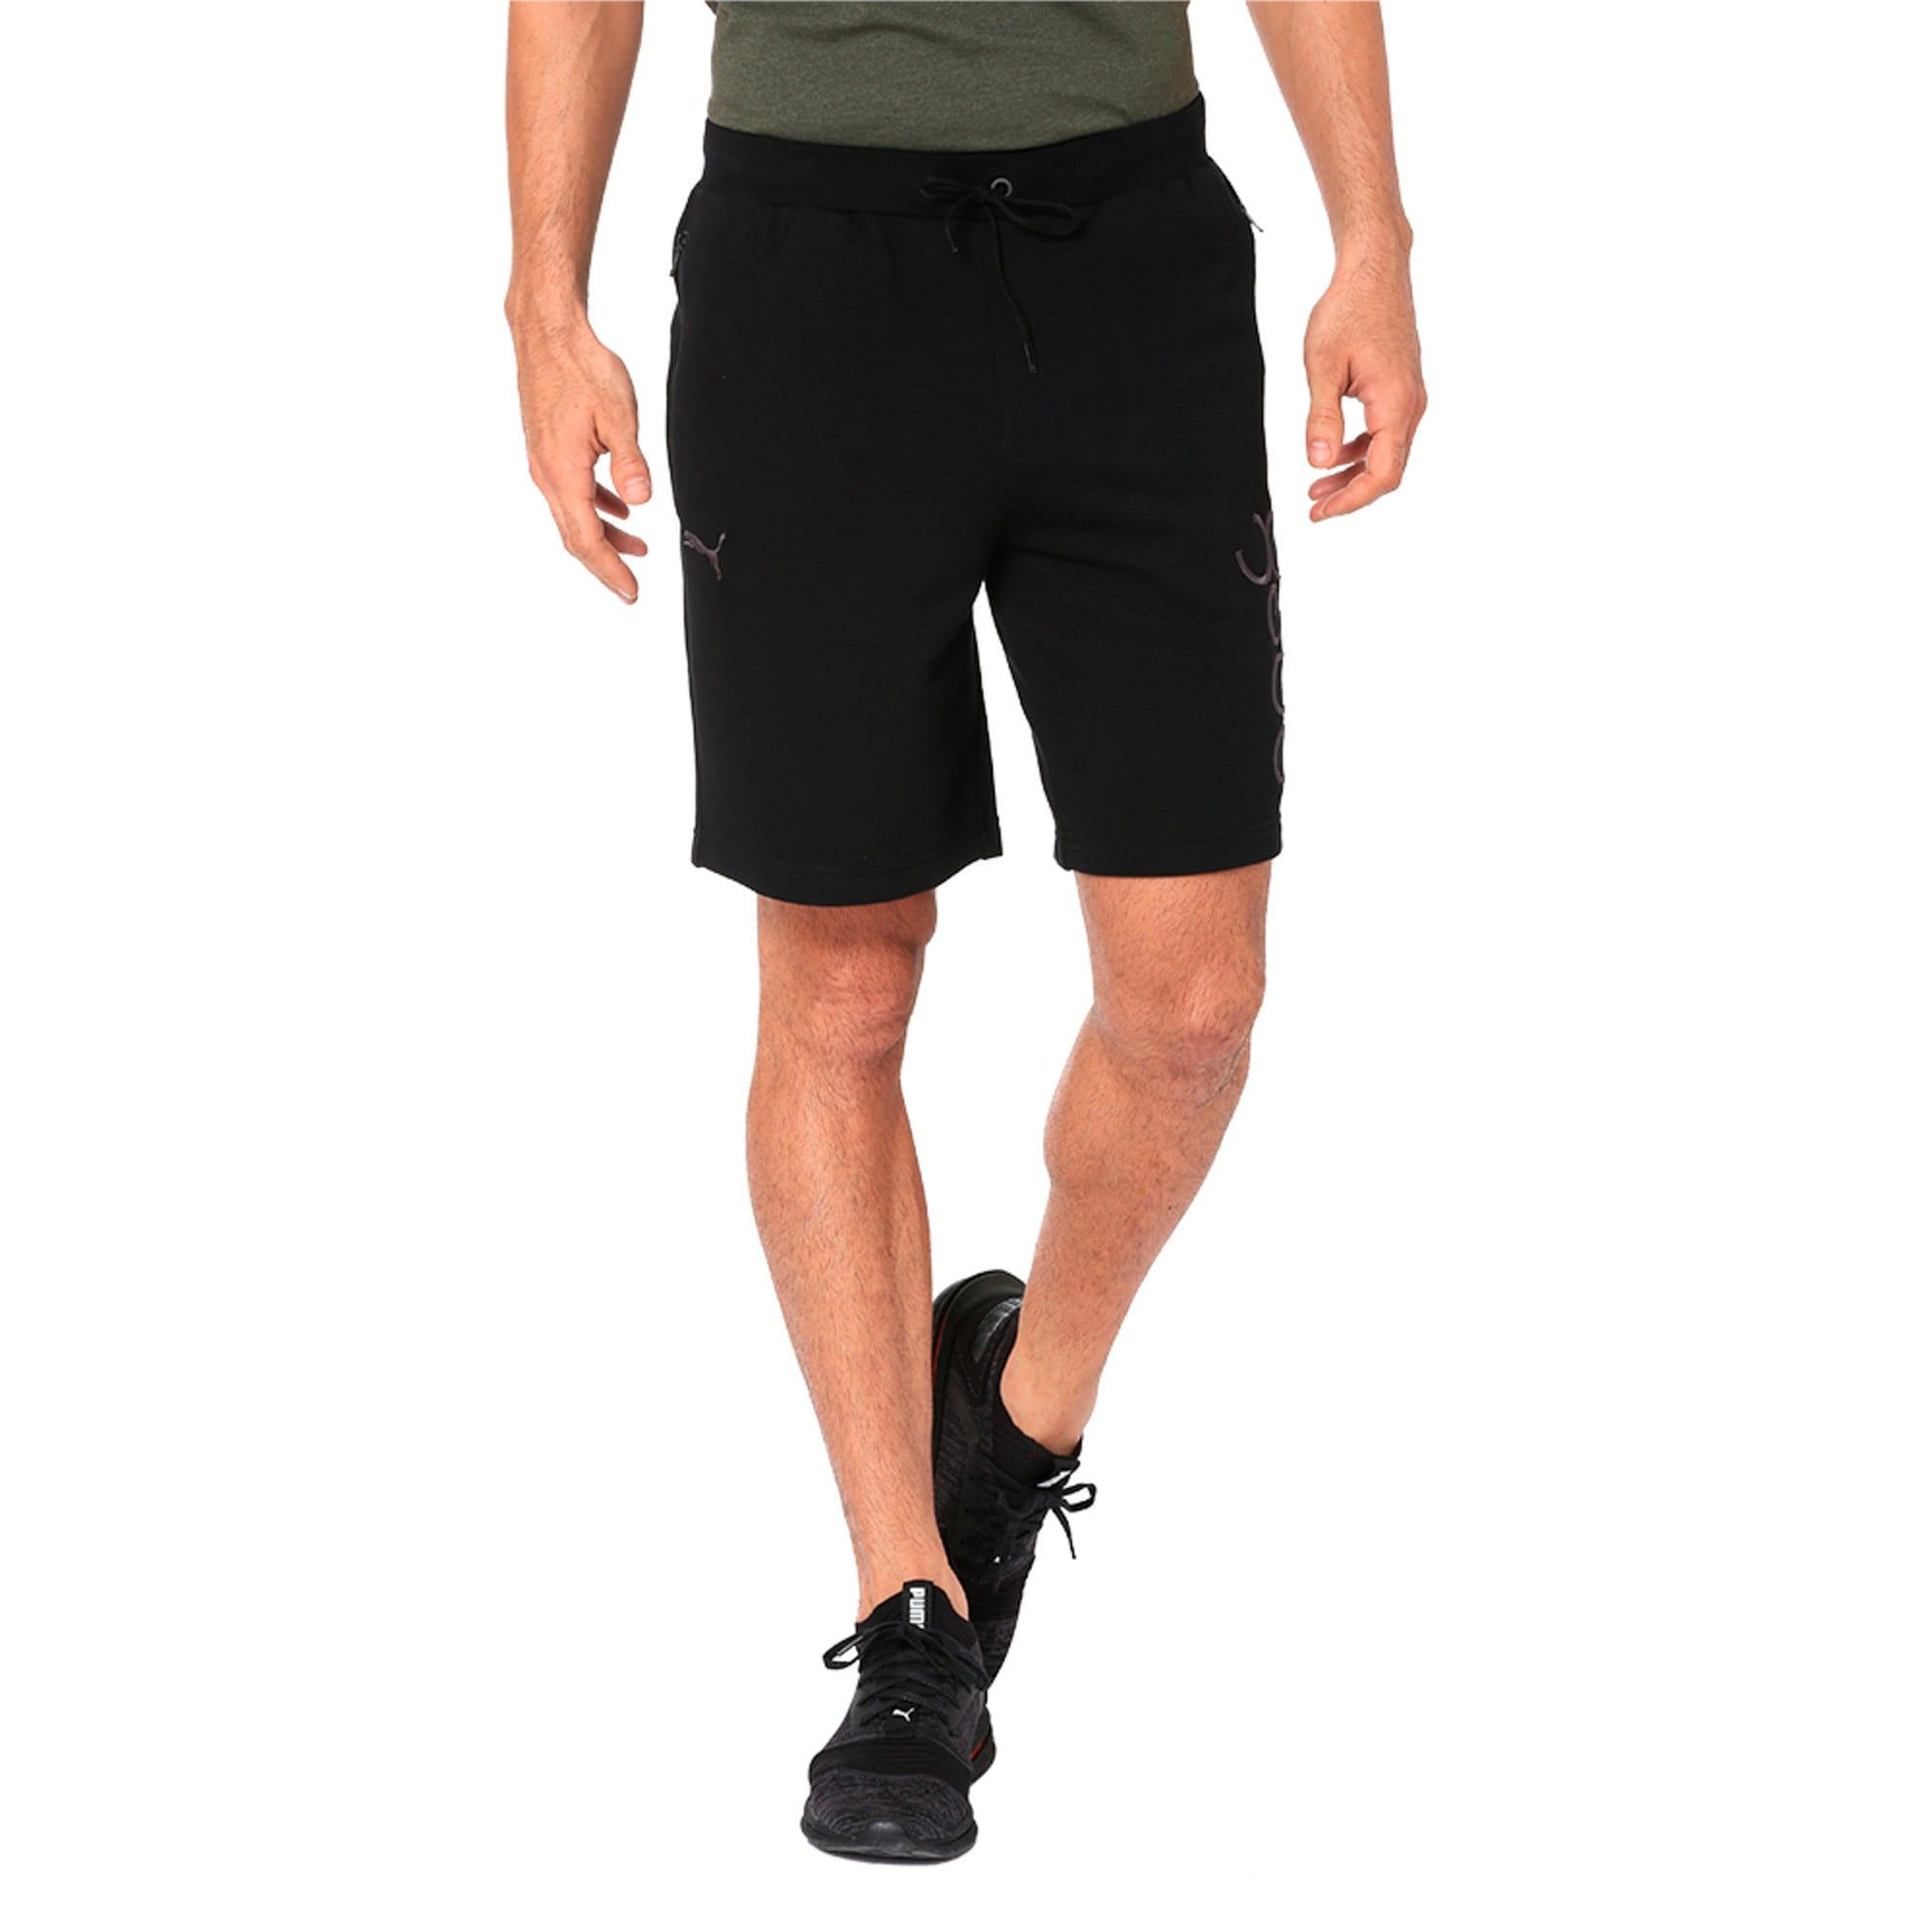 Thumbnail 4 of One8 VK Men's Sweat Shorts, Puma Black, medium-IND